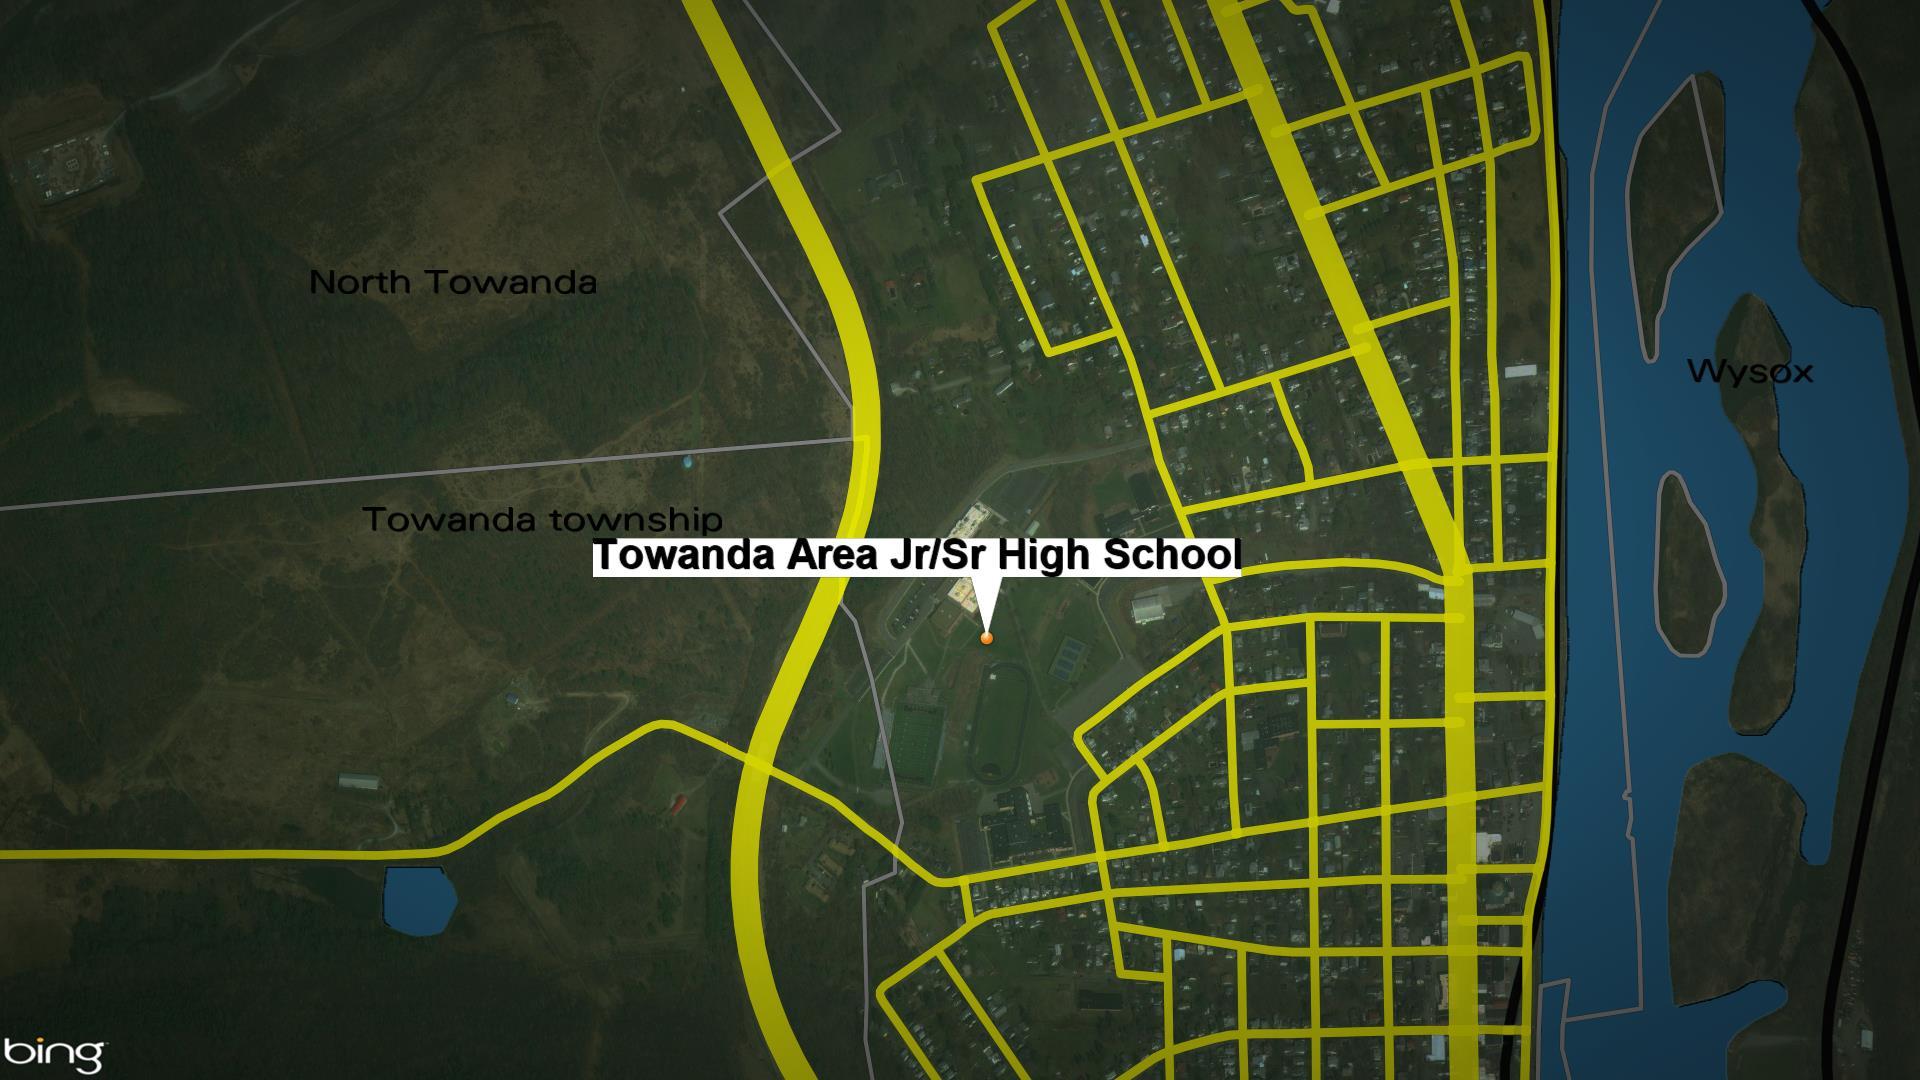 Towanda Area Jr Sr High School_1540510312655.jpg-118809198.jpg